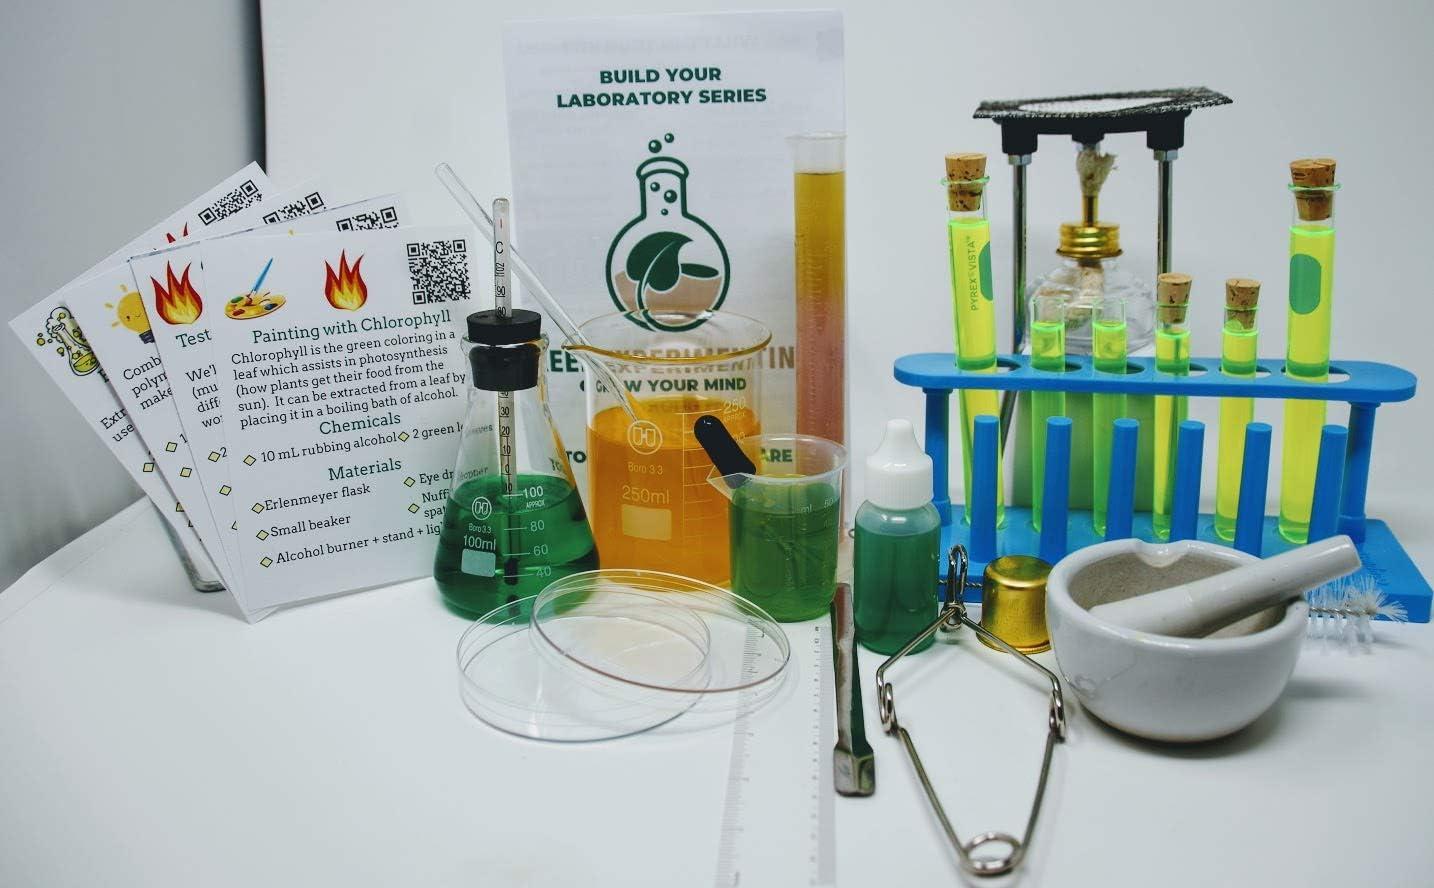 Best Science Supplies Chemistry LAB Set - Basic Professional Equipment